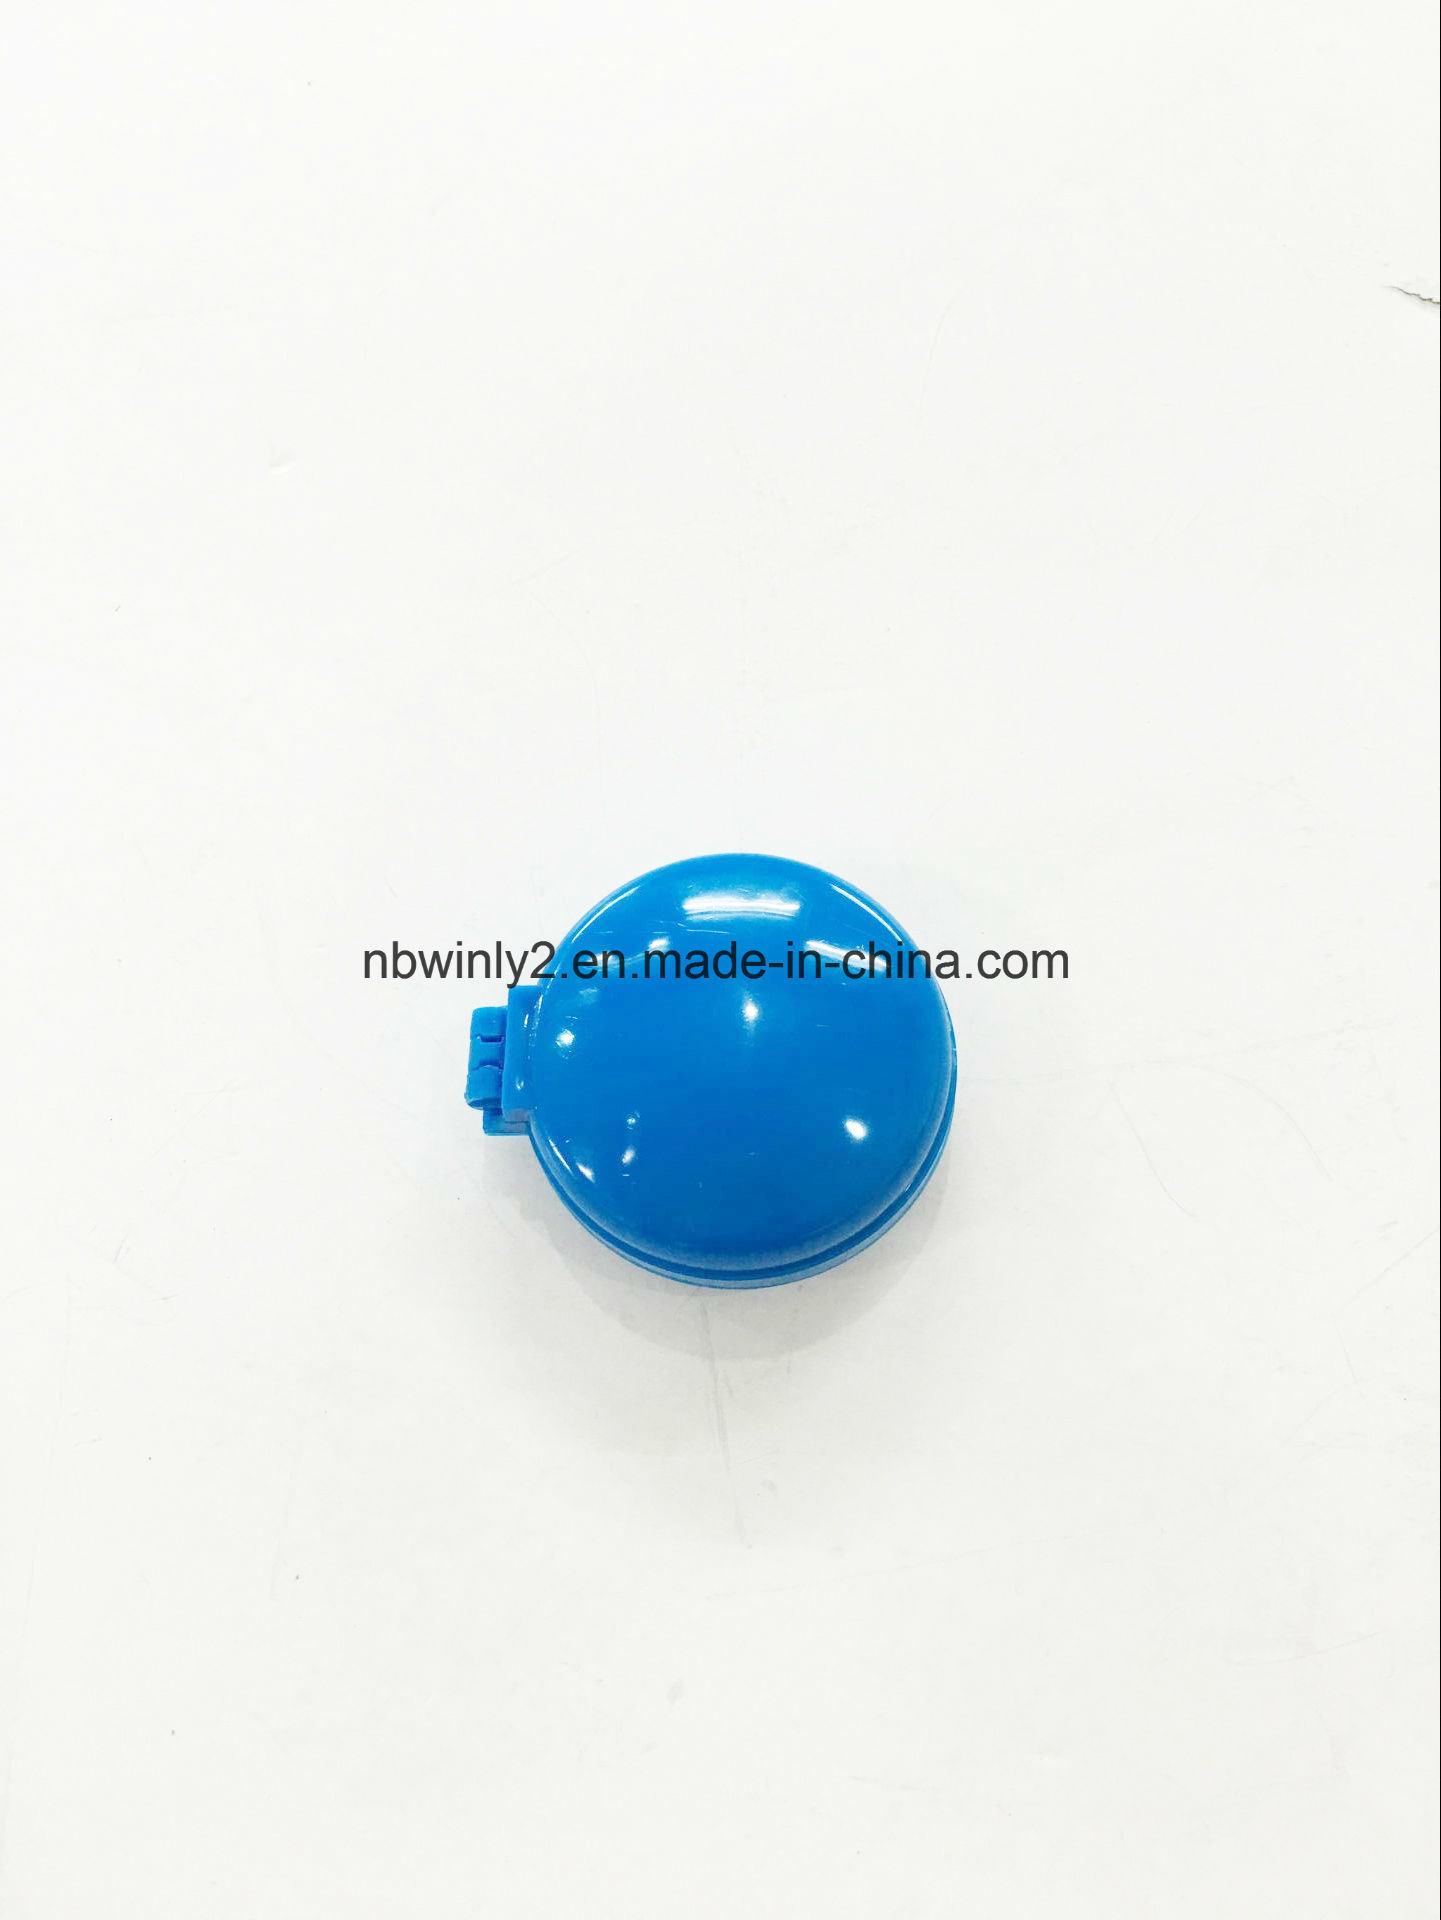 Round Foldable Mini Plastic Brush with Mirror